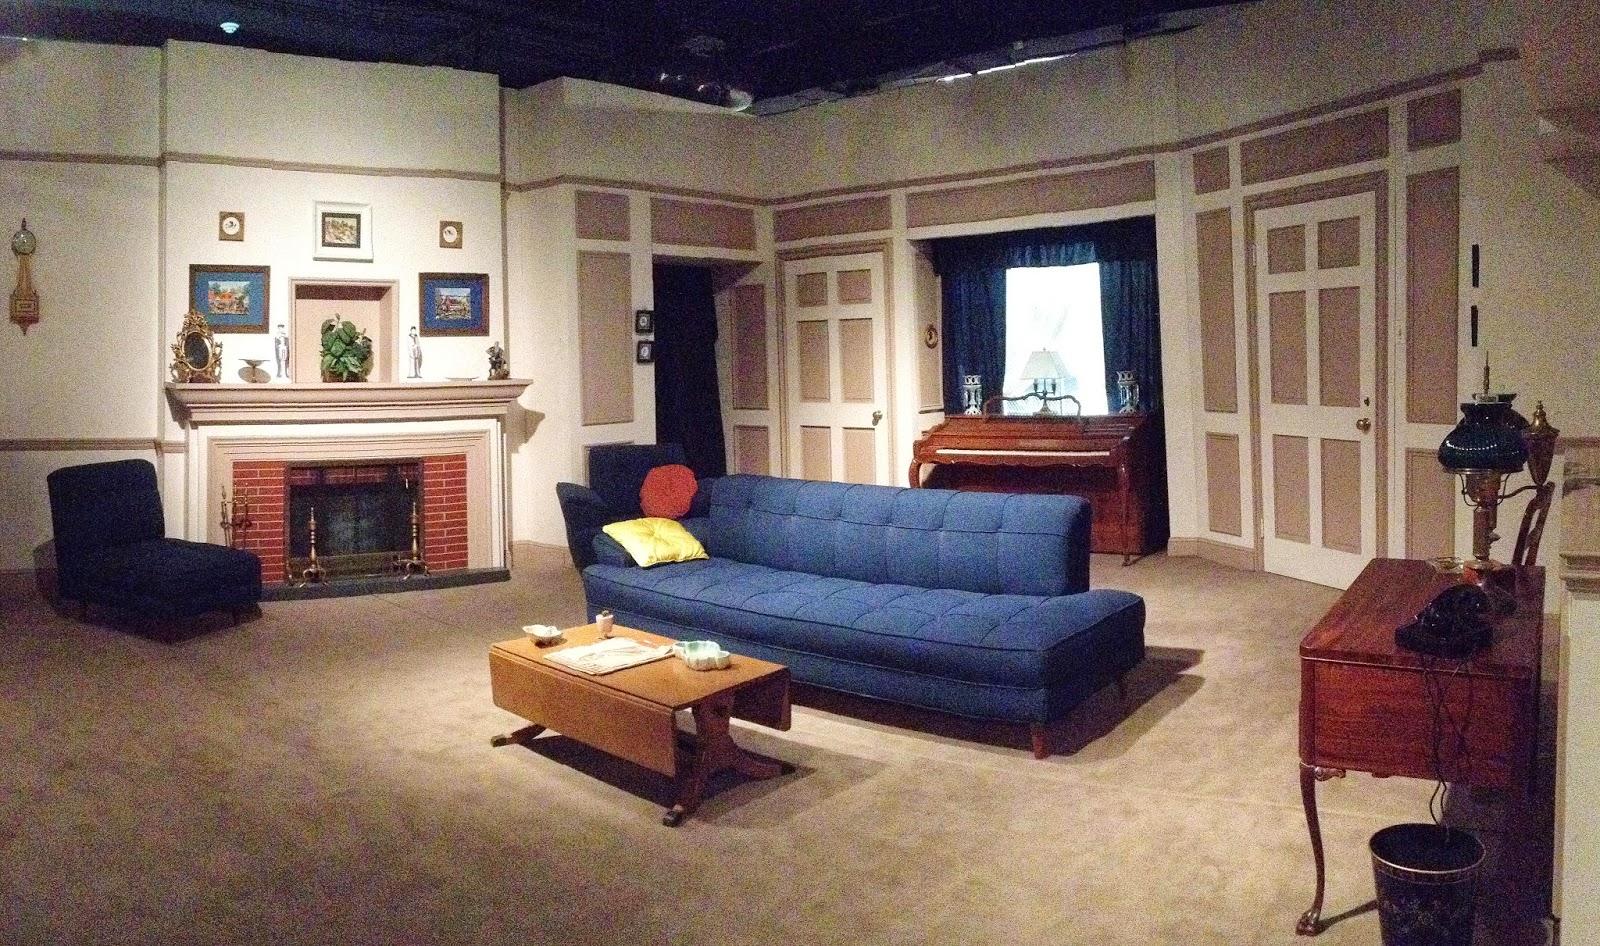 Entertaining Views From Cincinnati The Lucy Desi Center